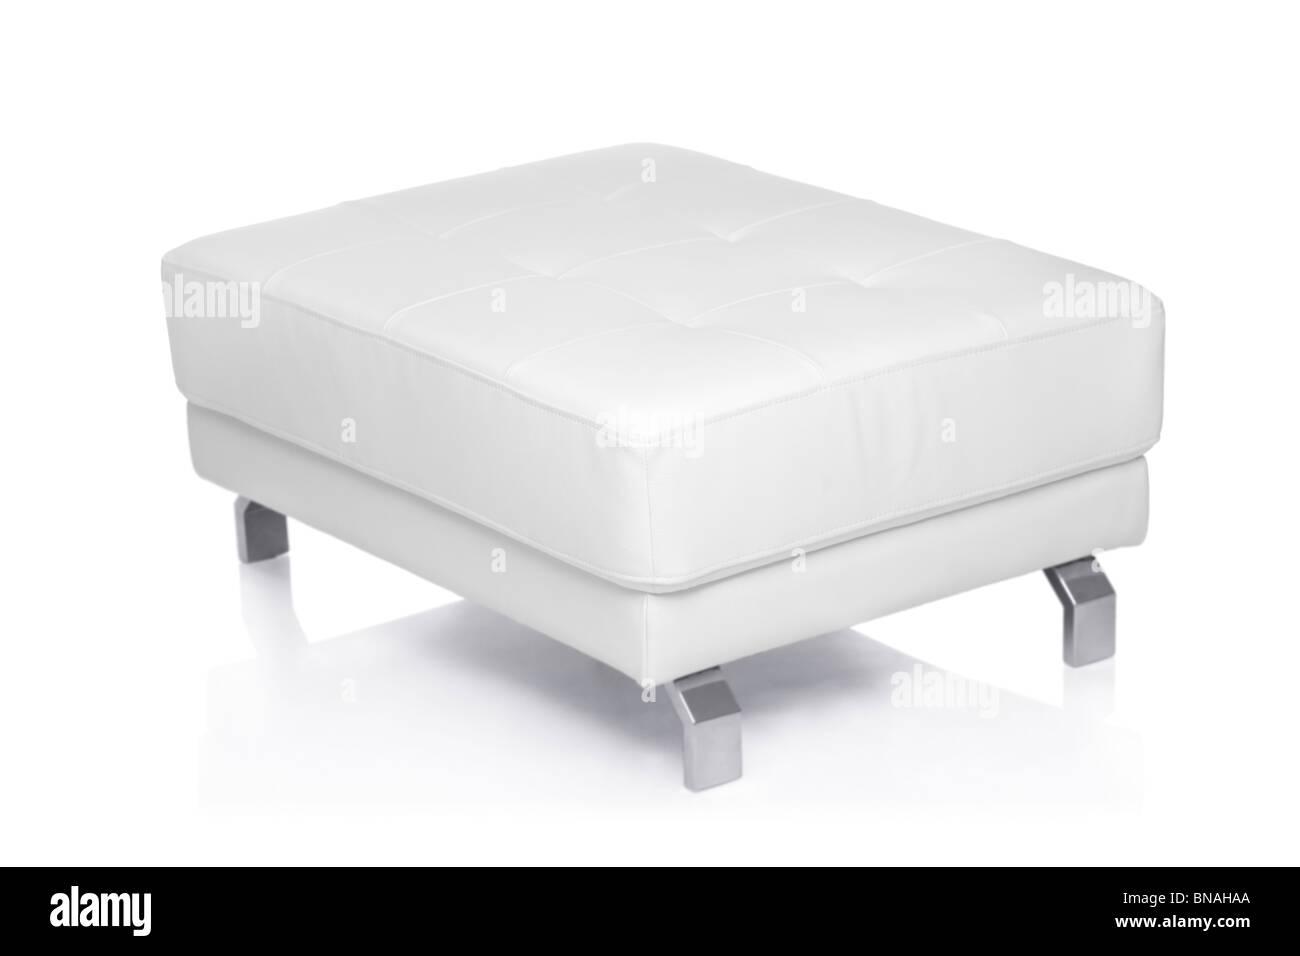 White footstool - Stock Image